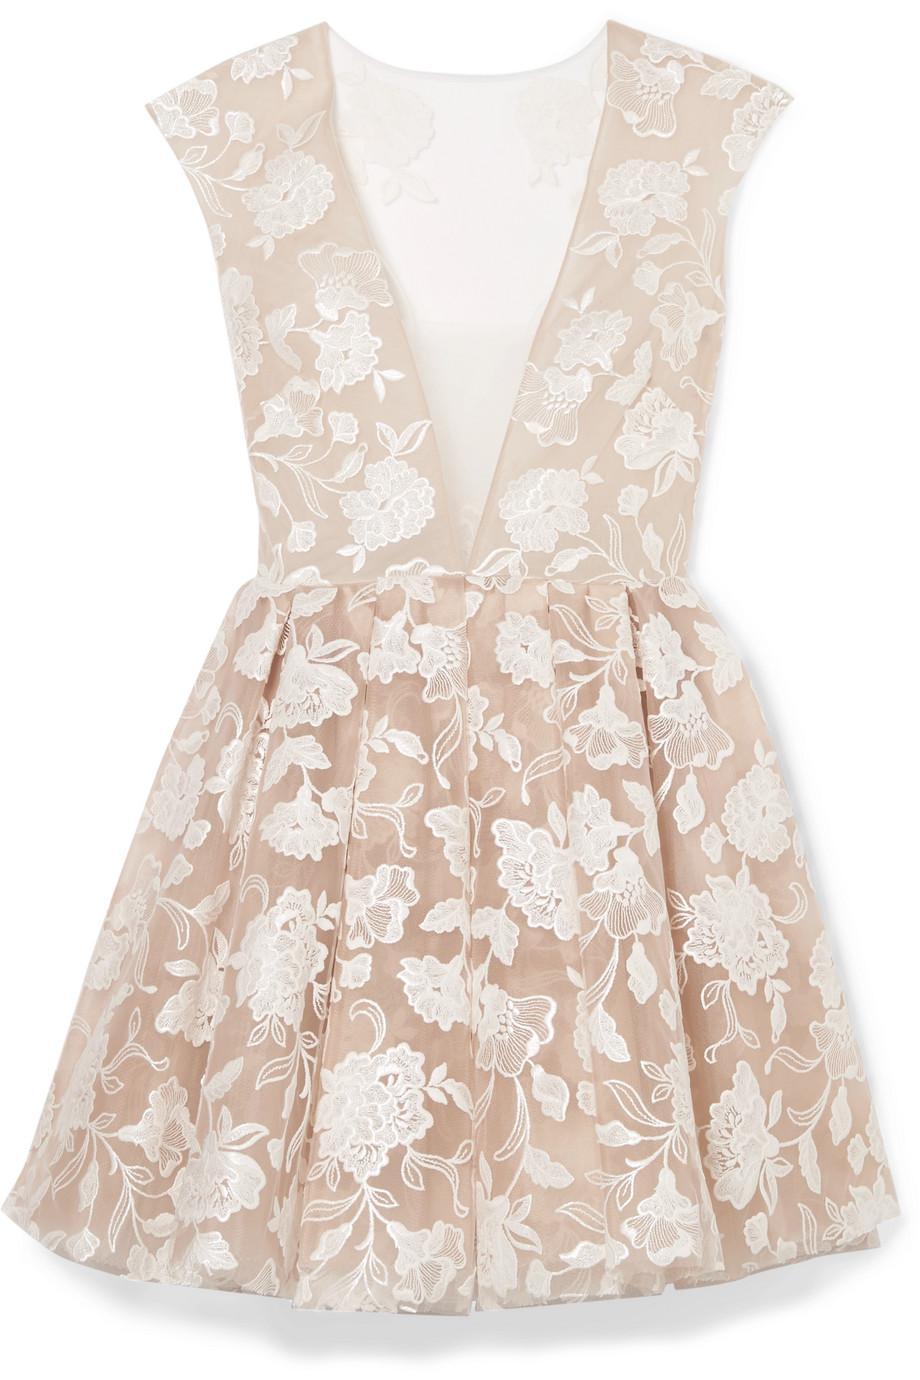 Rory Embroidered Tulle Mini Dress - White Rime Arodaky Jt5p8hxI